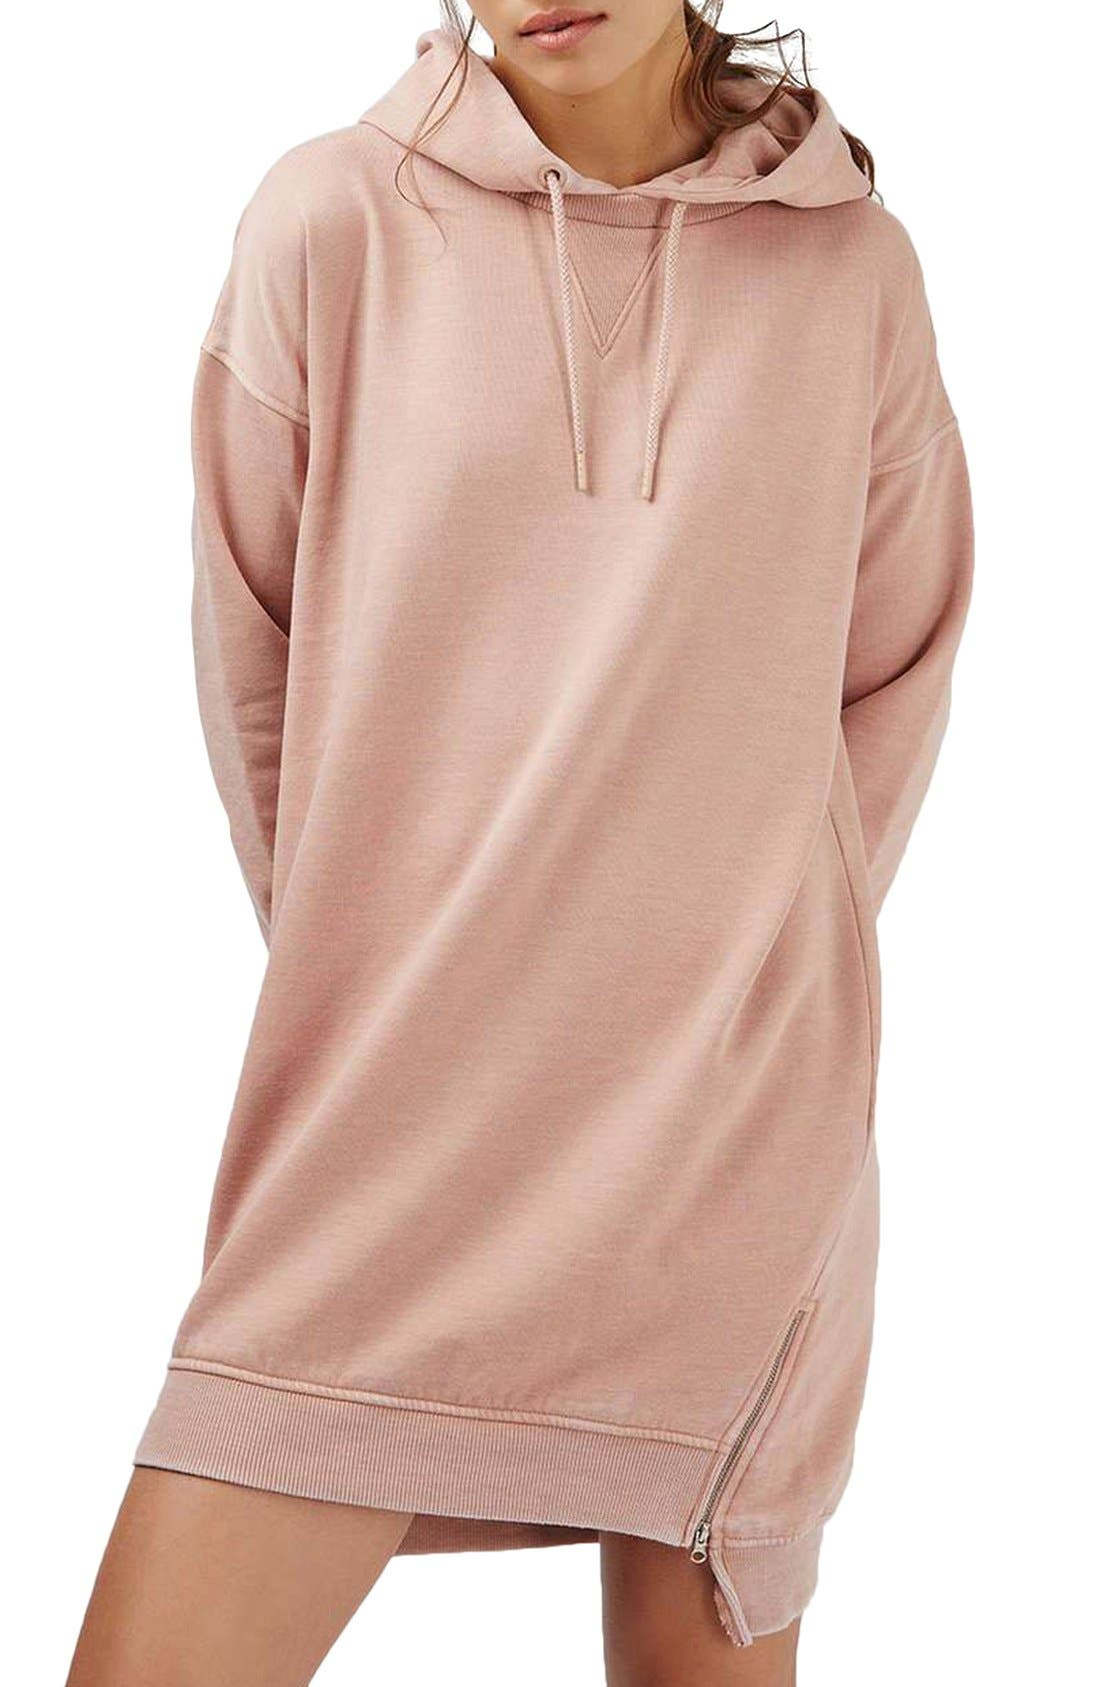 Main Image - Topshop Hooded Sweatshirt Dress